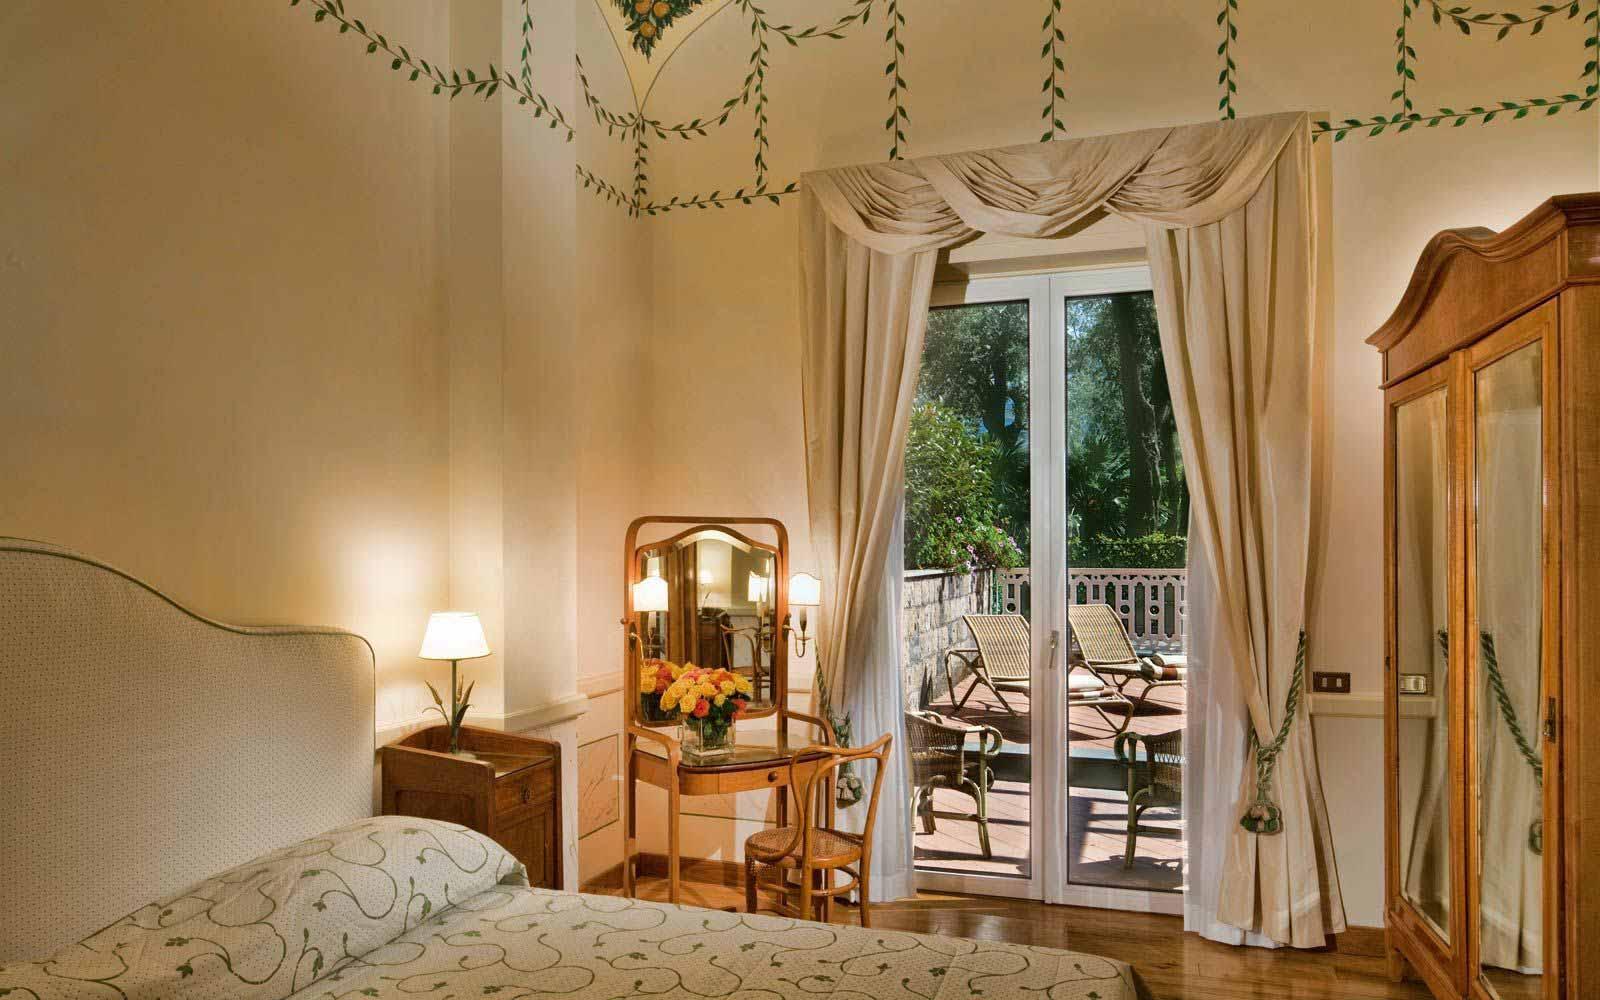 Suite Aranci at the Grand Hotel Excelsior Vittoria